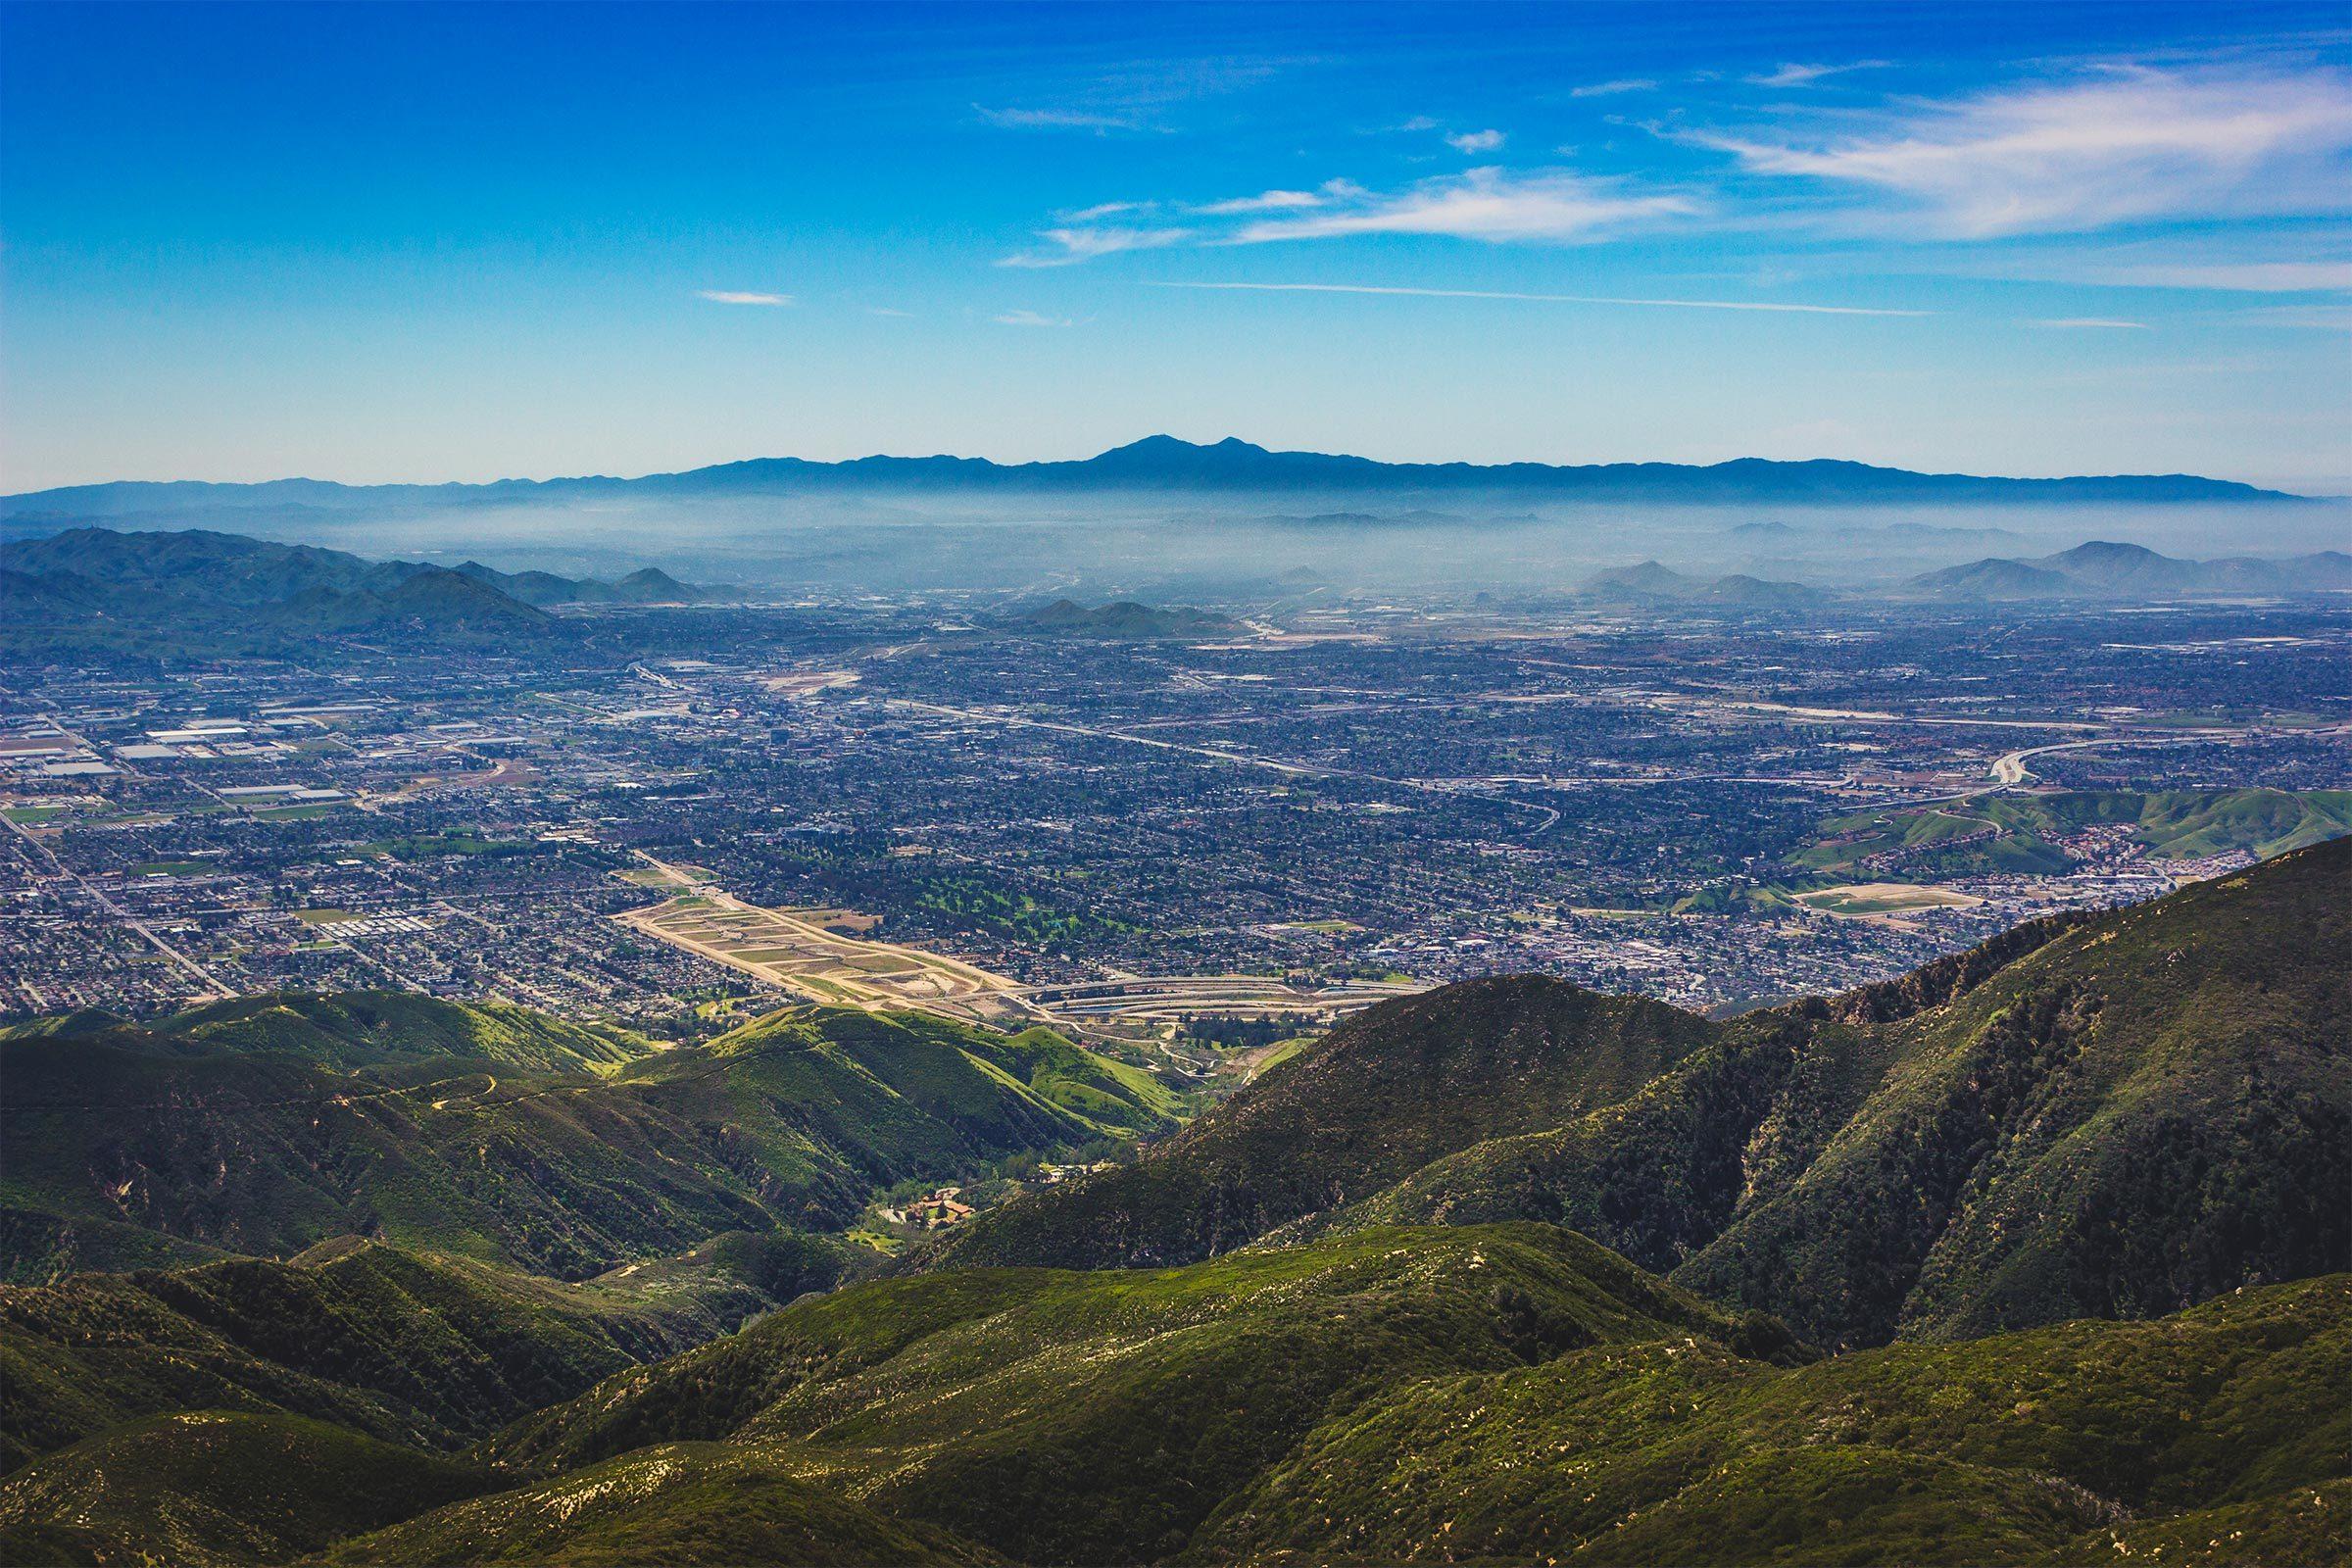 Breathtaking view of the San Bernardino Valley from the San Bernardino Mountains with Santa Ana Mountains visible in the distance, Rim of the World Scenic Overlook, San Bernardino County, California